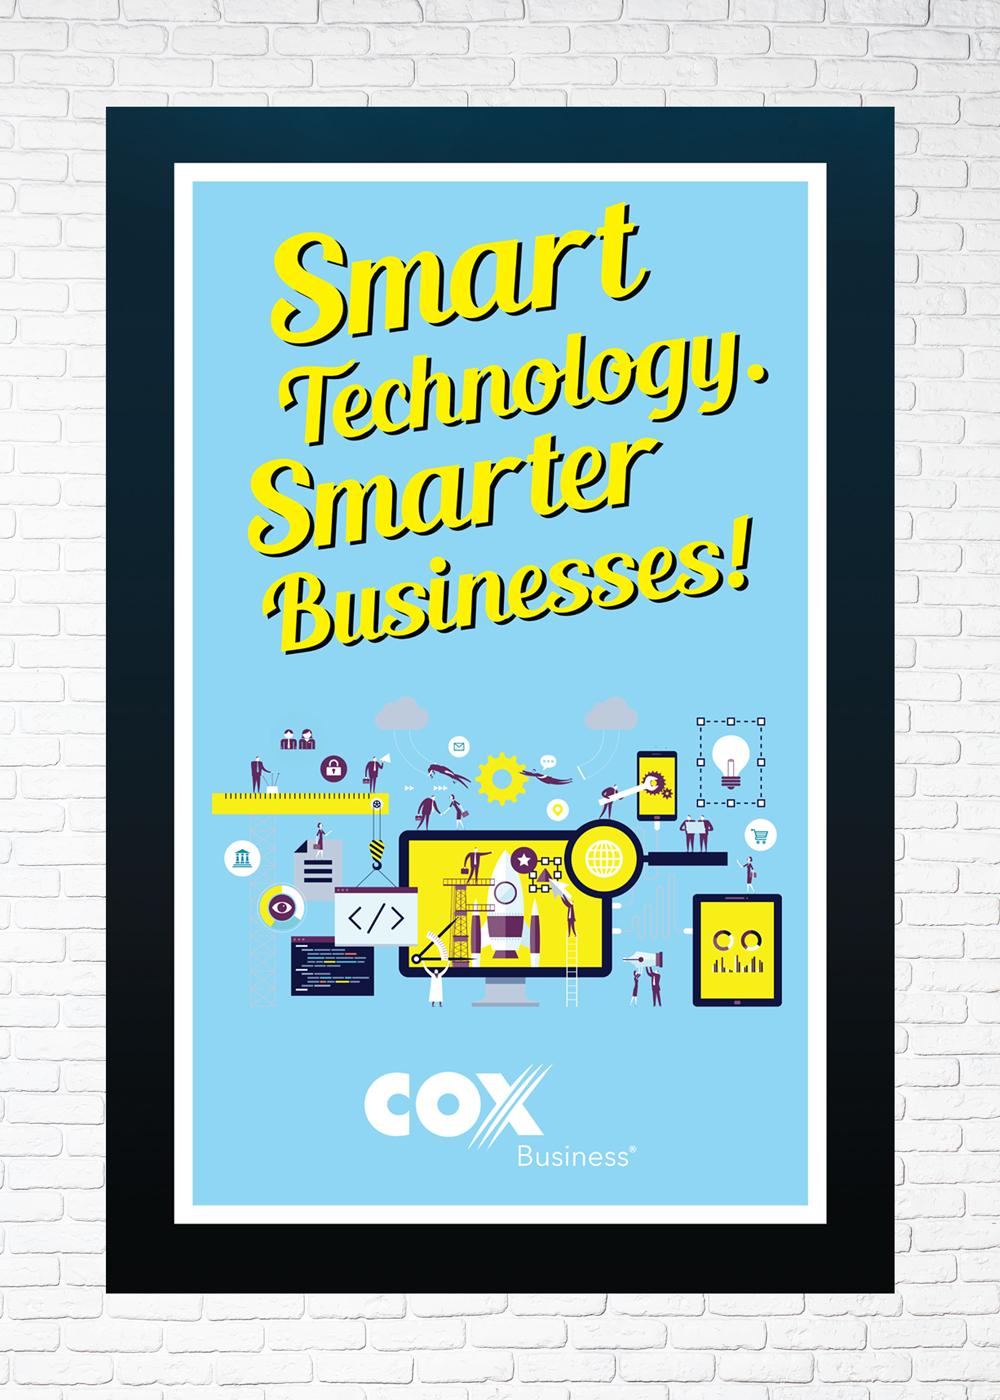 Cox Promotional Tour Poster 1